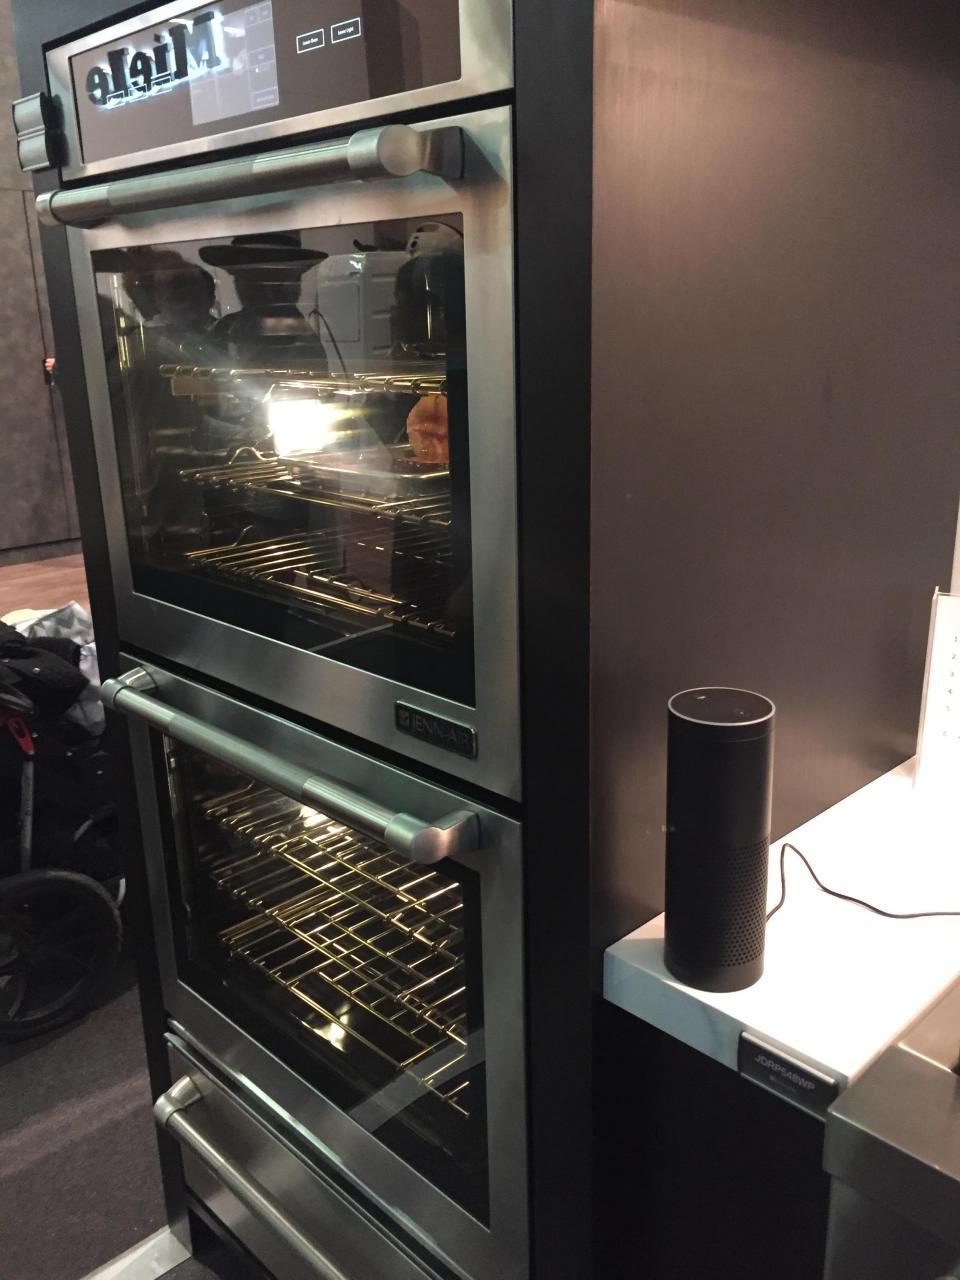 Jenn-Air wall oven